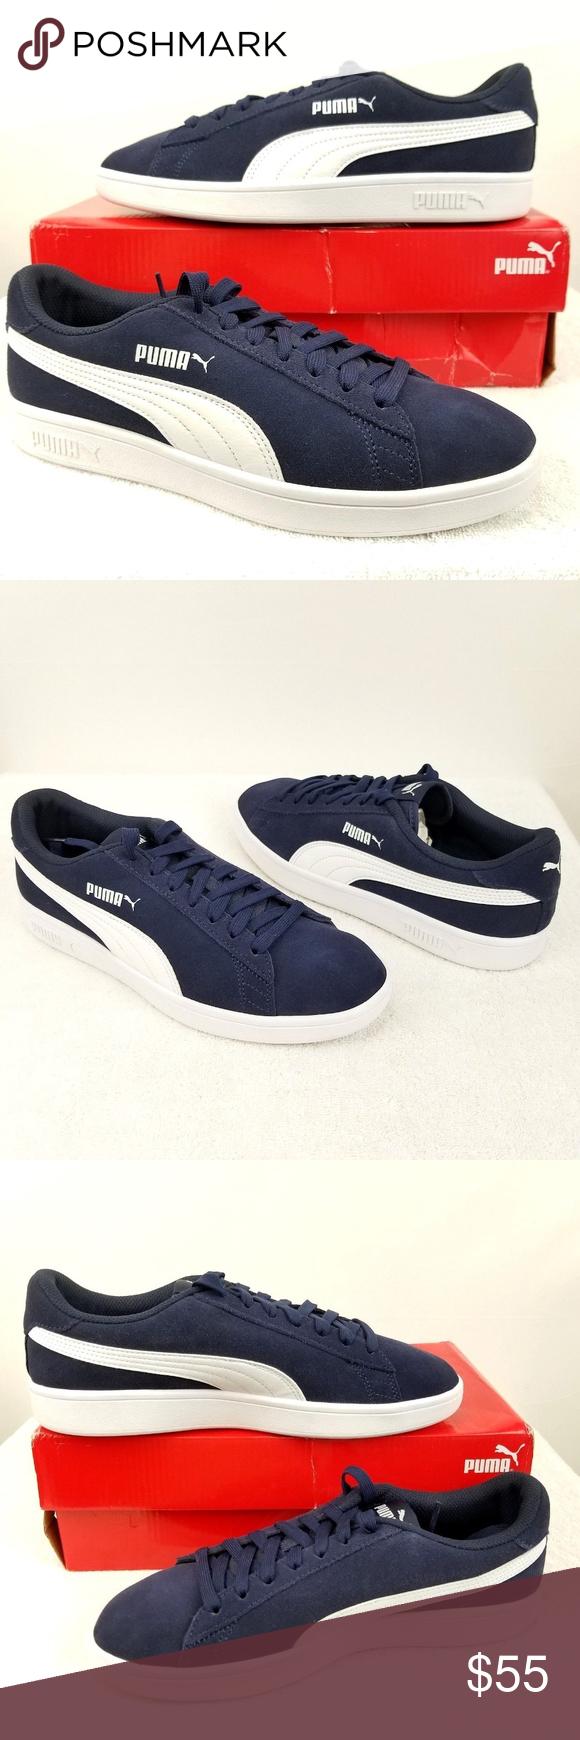 Puma Smash V2 Sneaker 364989 04 Peacoat